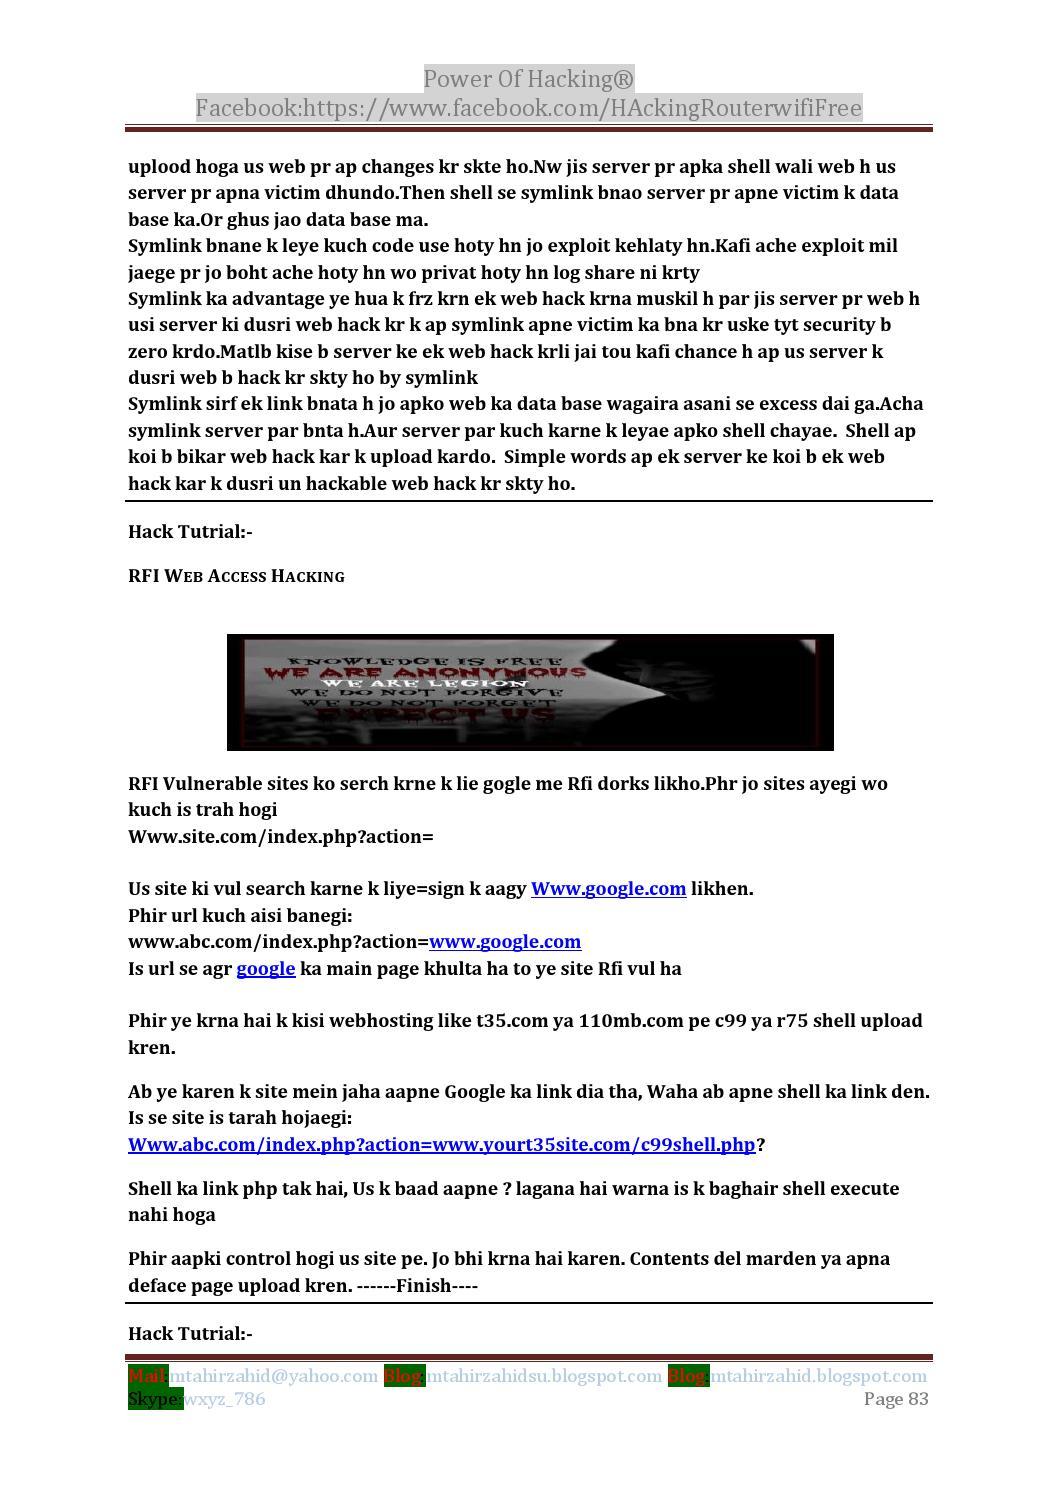 Ja Ha Link En Ik Gaan | Dejachthoorn